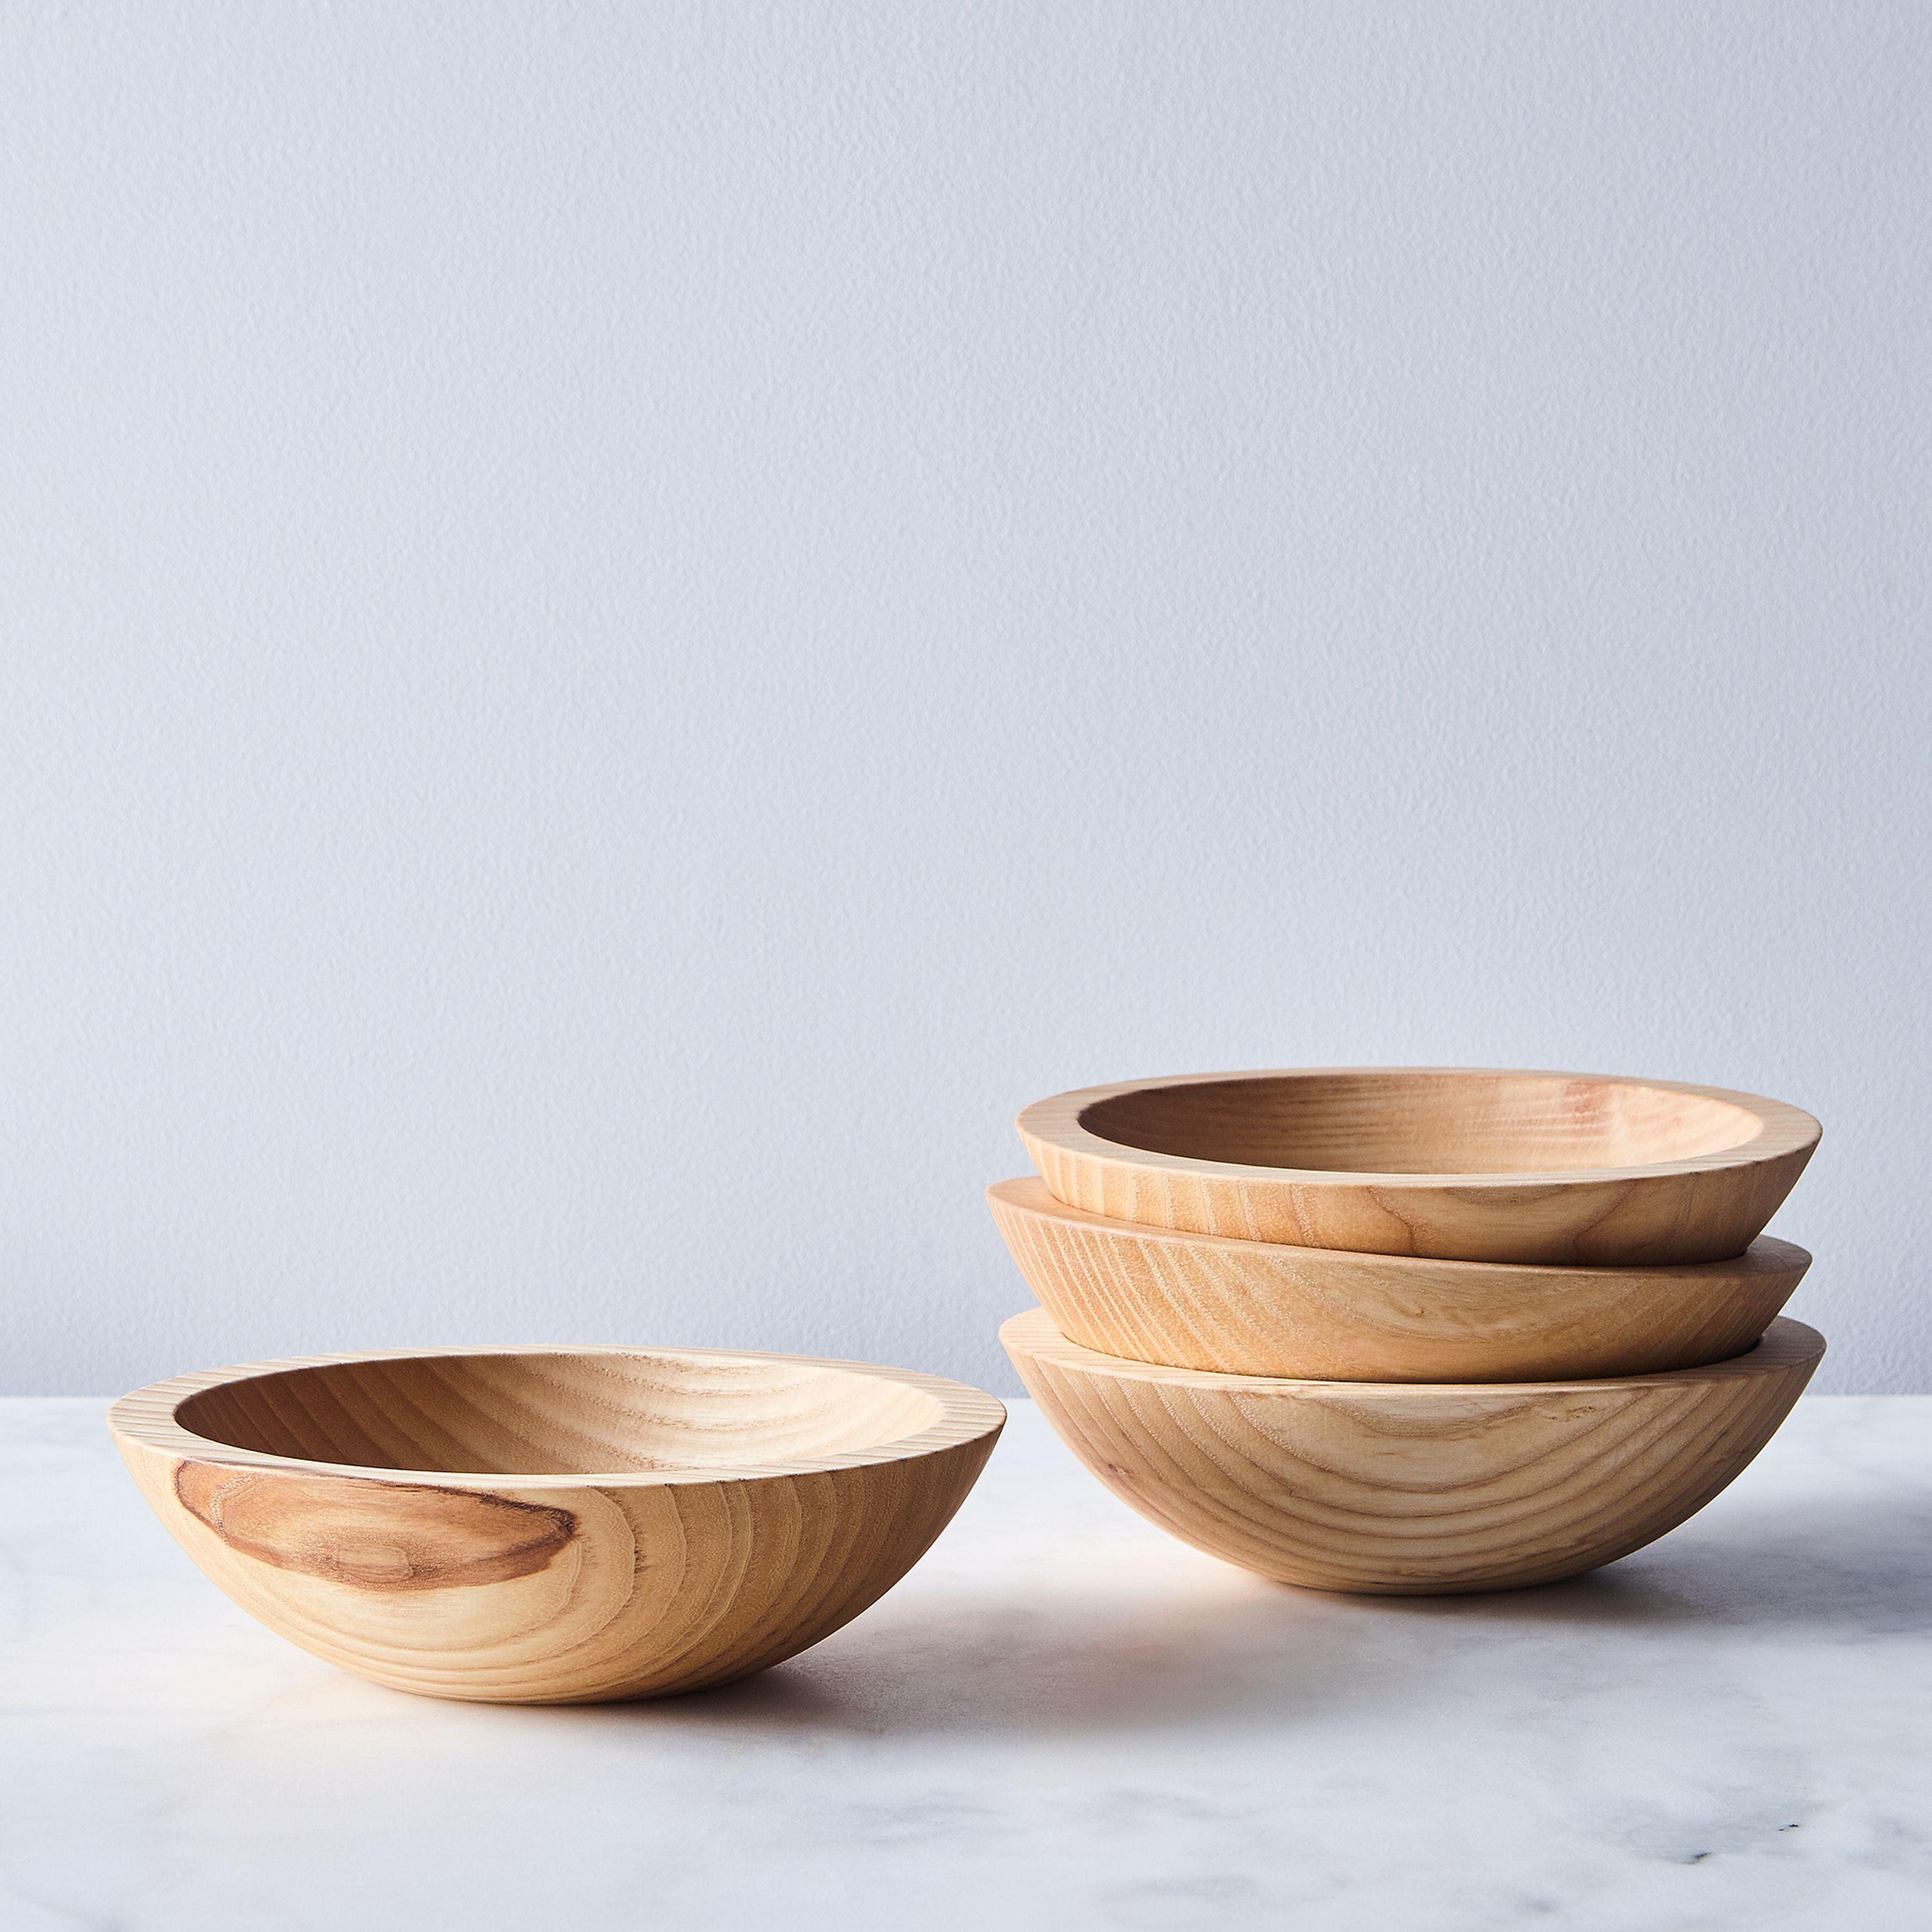 7in Serving Bowls Rusticity Wood Serving Bowl Salad Bowl Mango Wood Handmade Carved 4law Lt